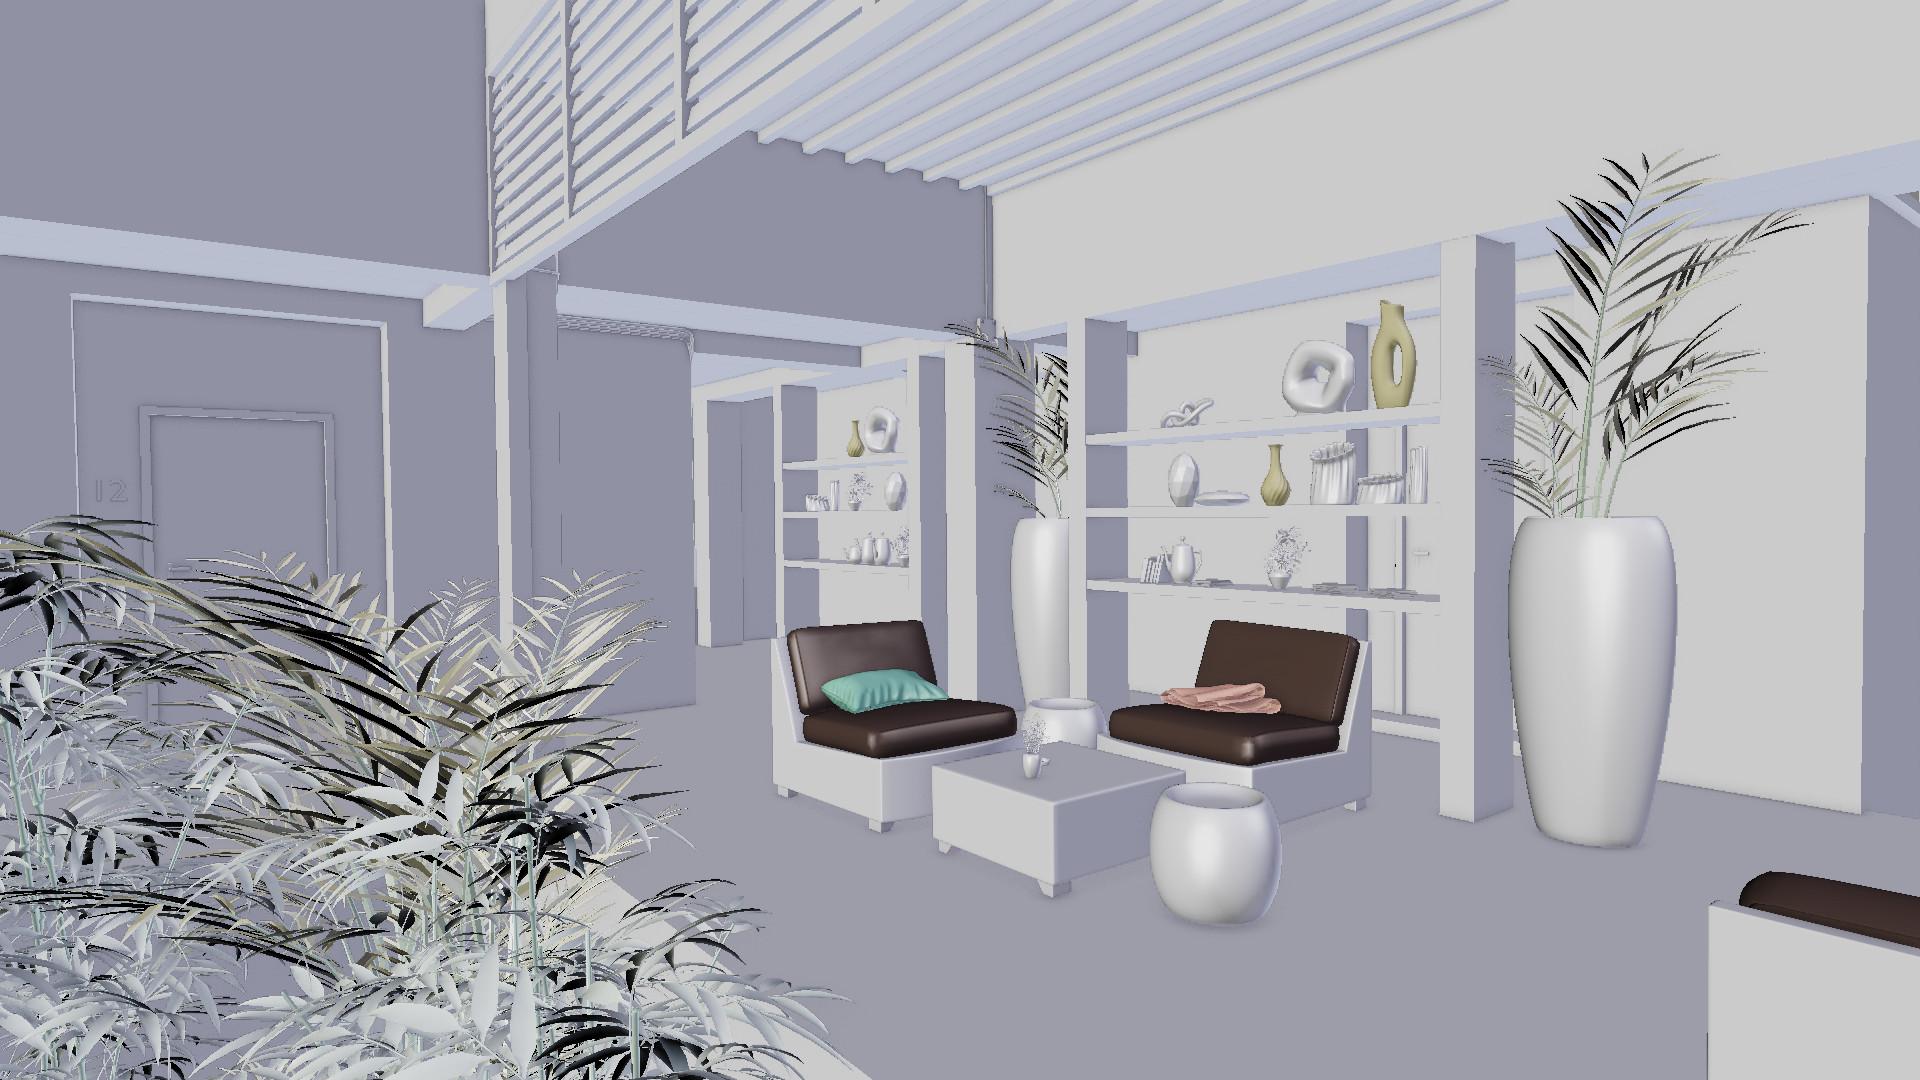 Victor duarte thai hotel render 3d